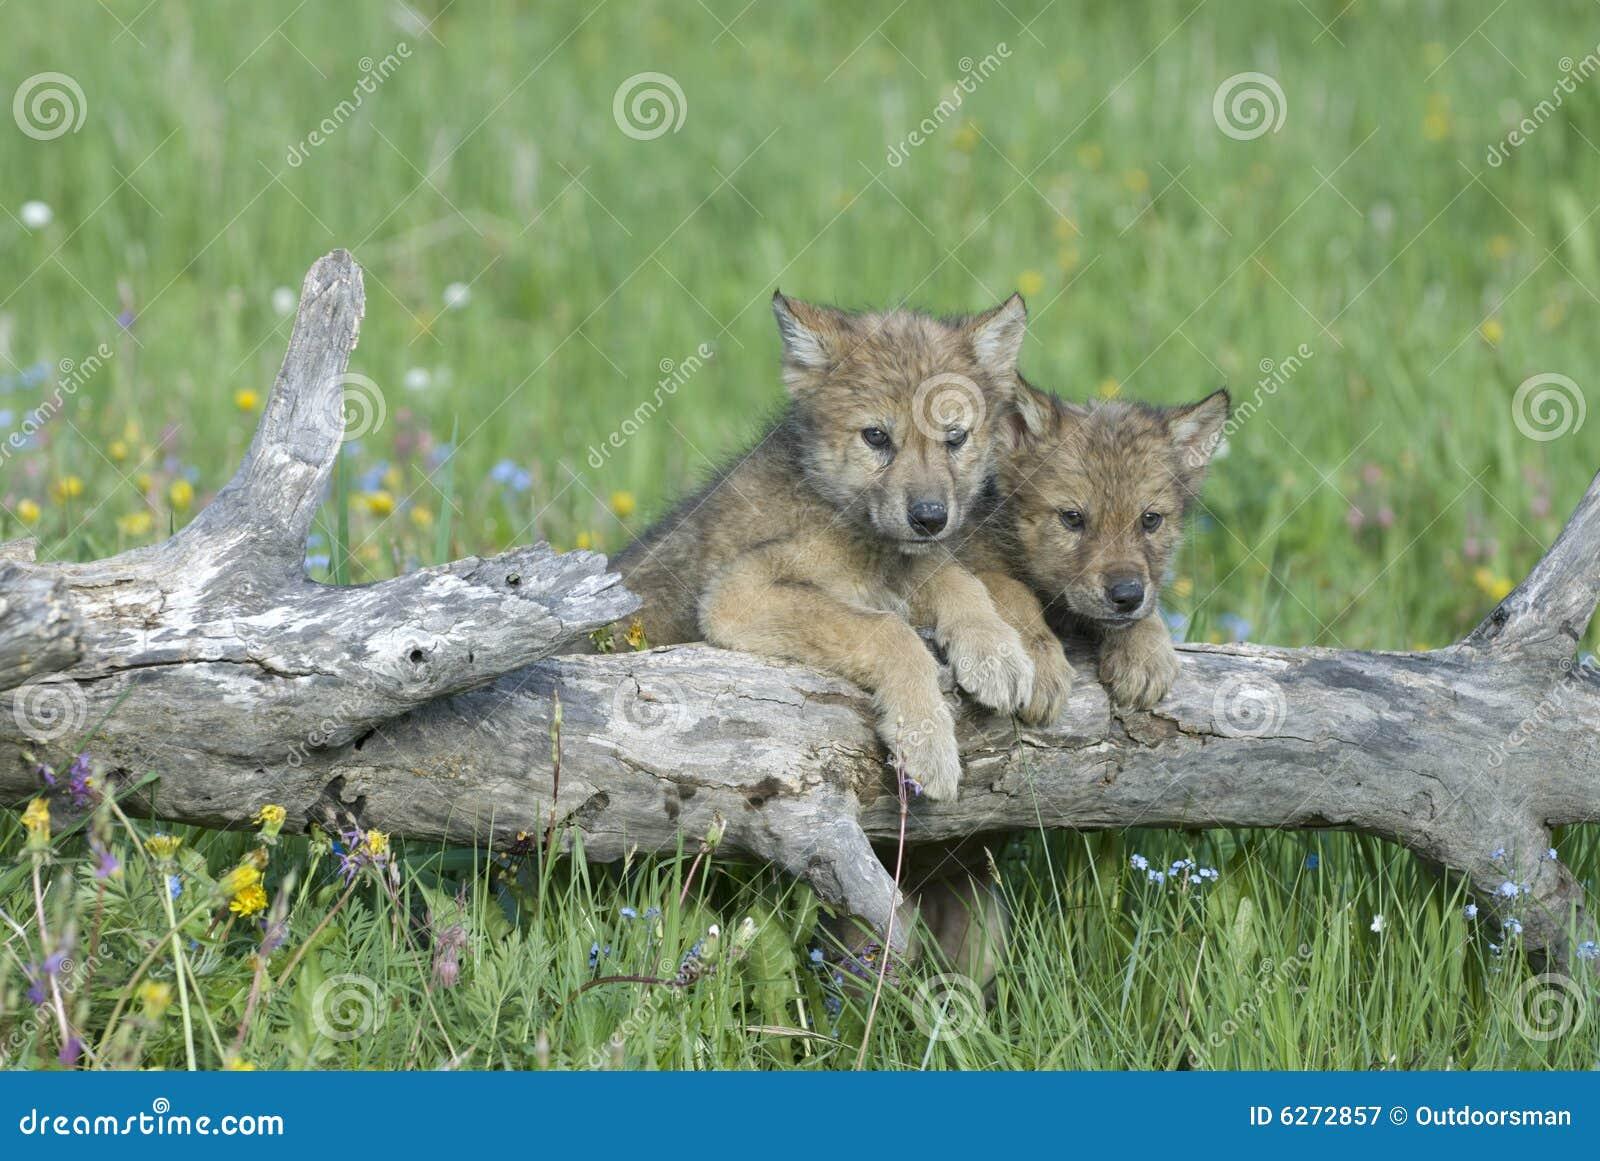 Cachorros de lobo gris